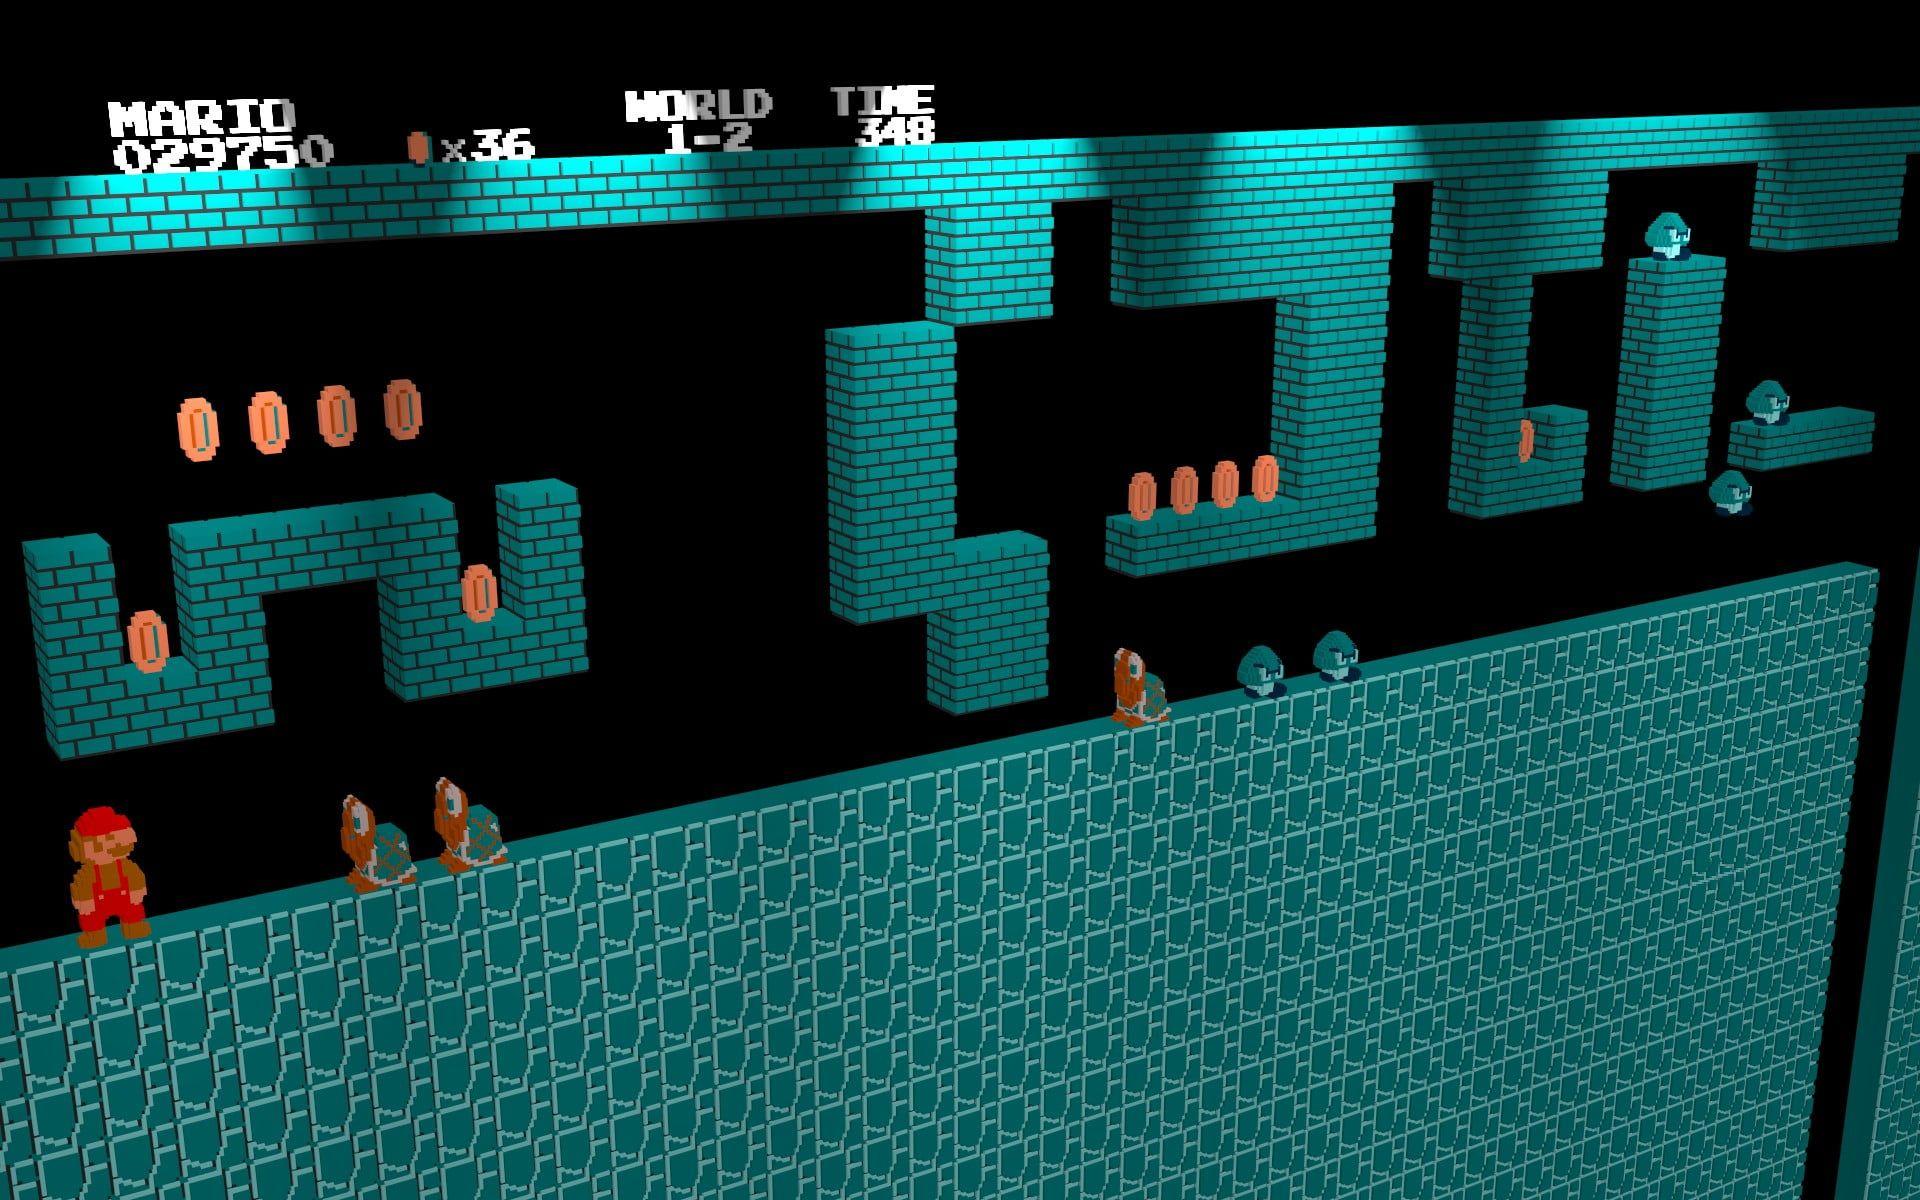 Super Mario Game Application Screenshot Nintendo Entertainment System Retro Games Mario Bros 3d 1080p Wall Mario Bros Retro Games Wallpaper Game Mario Bros